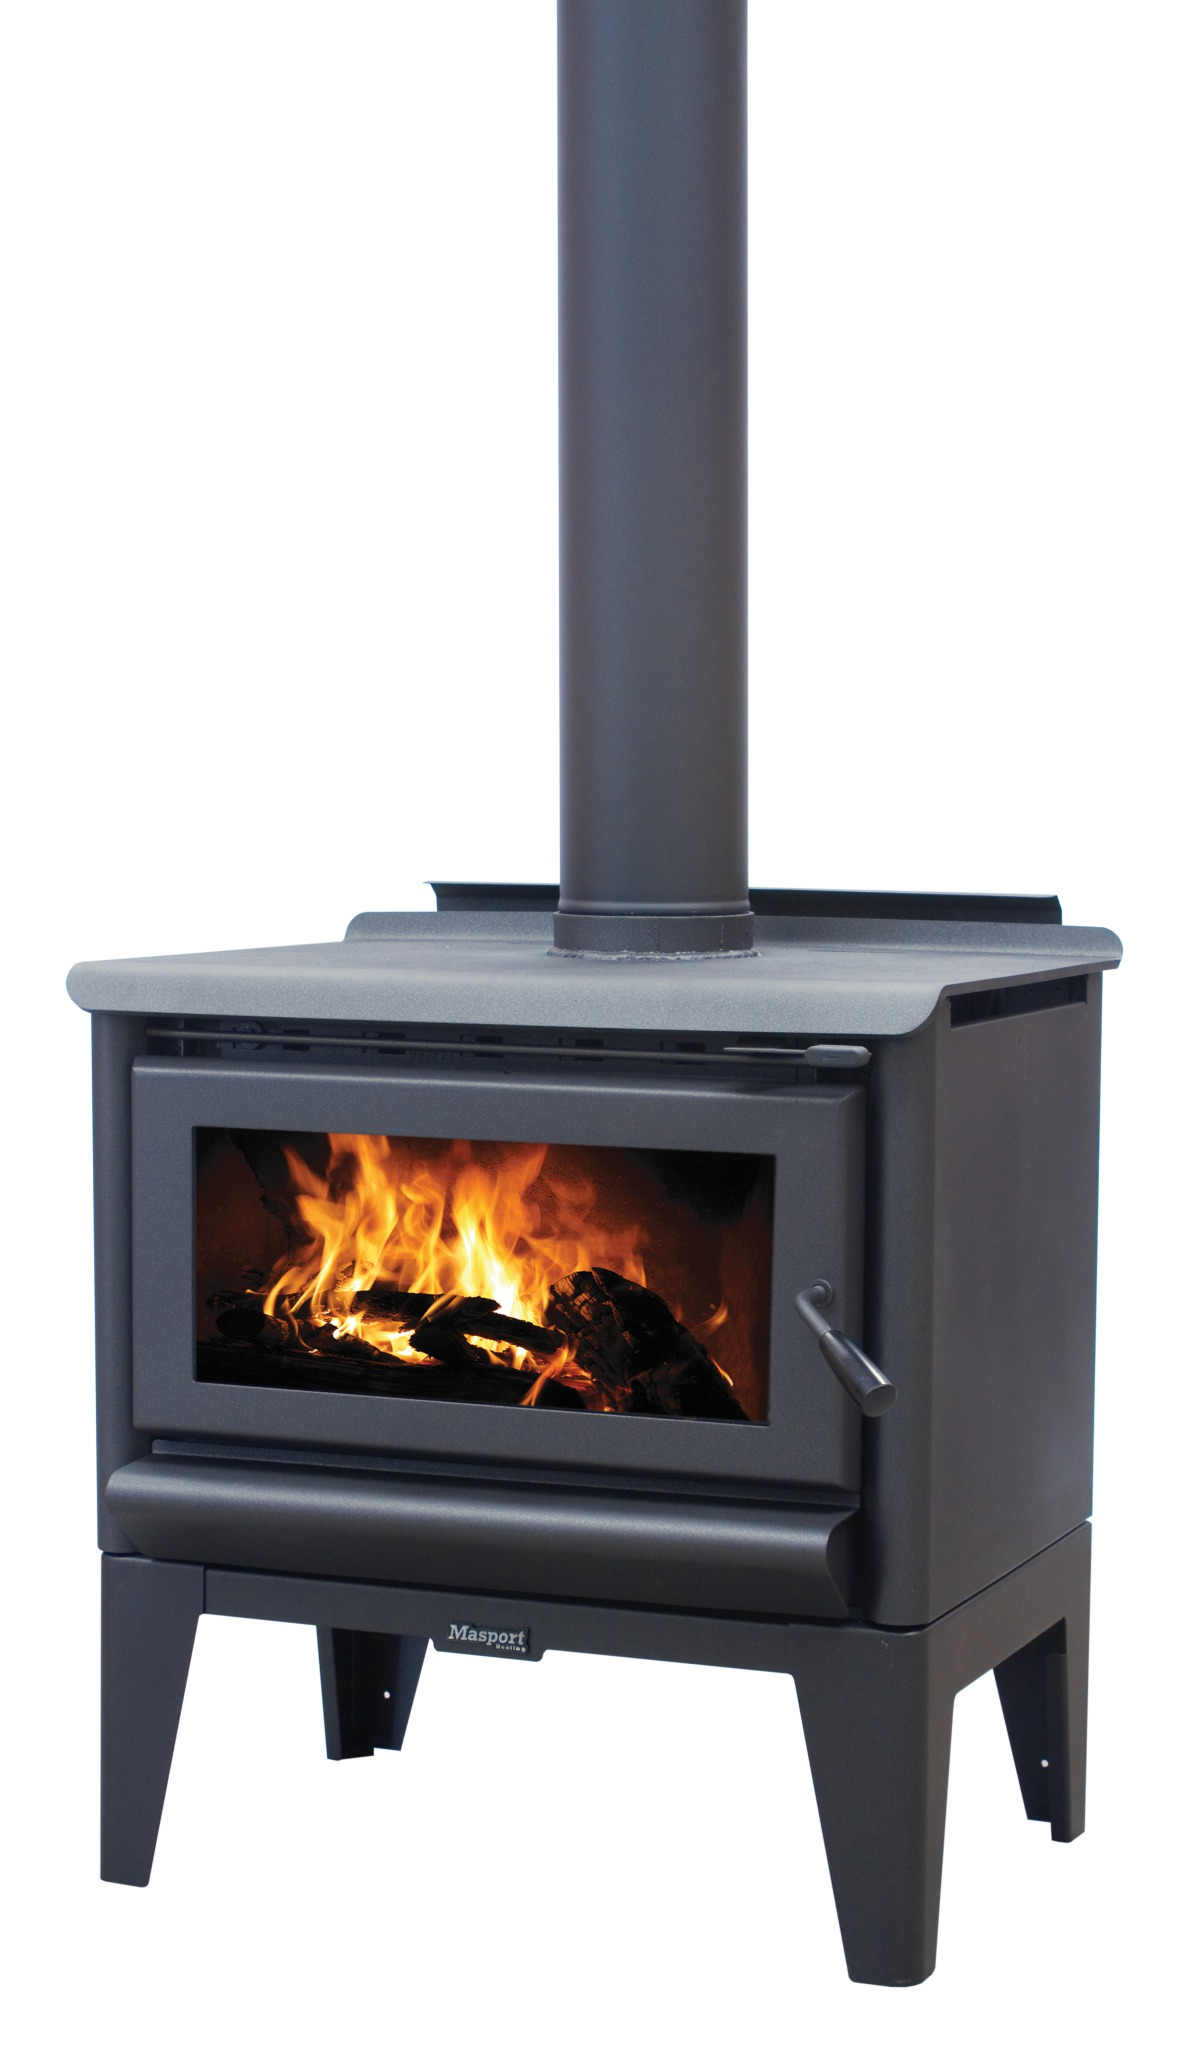 MASPORT R5000 – Freestanding Radiant Wood Burner With Legs